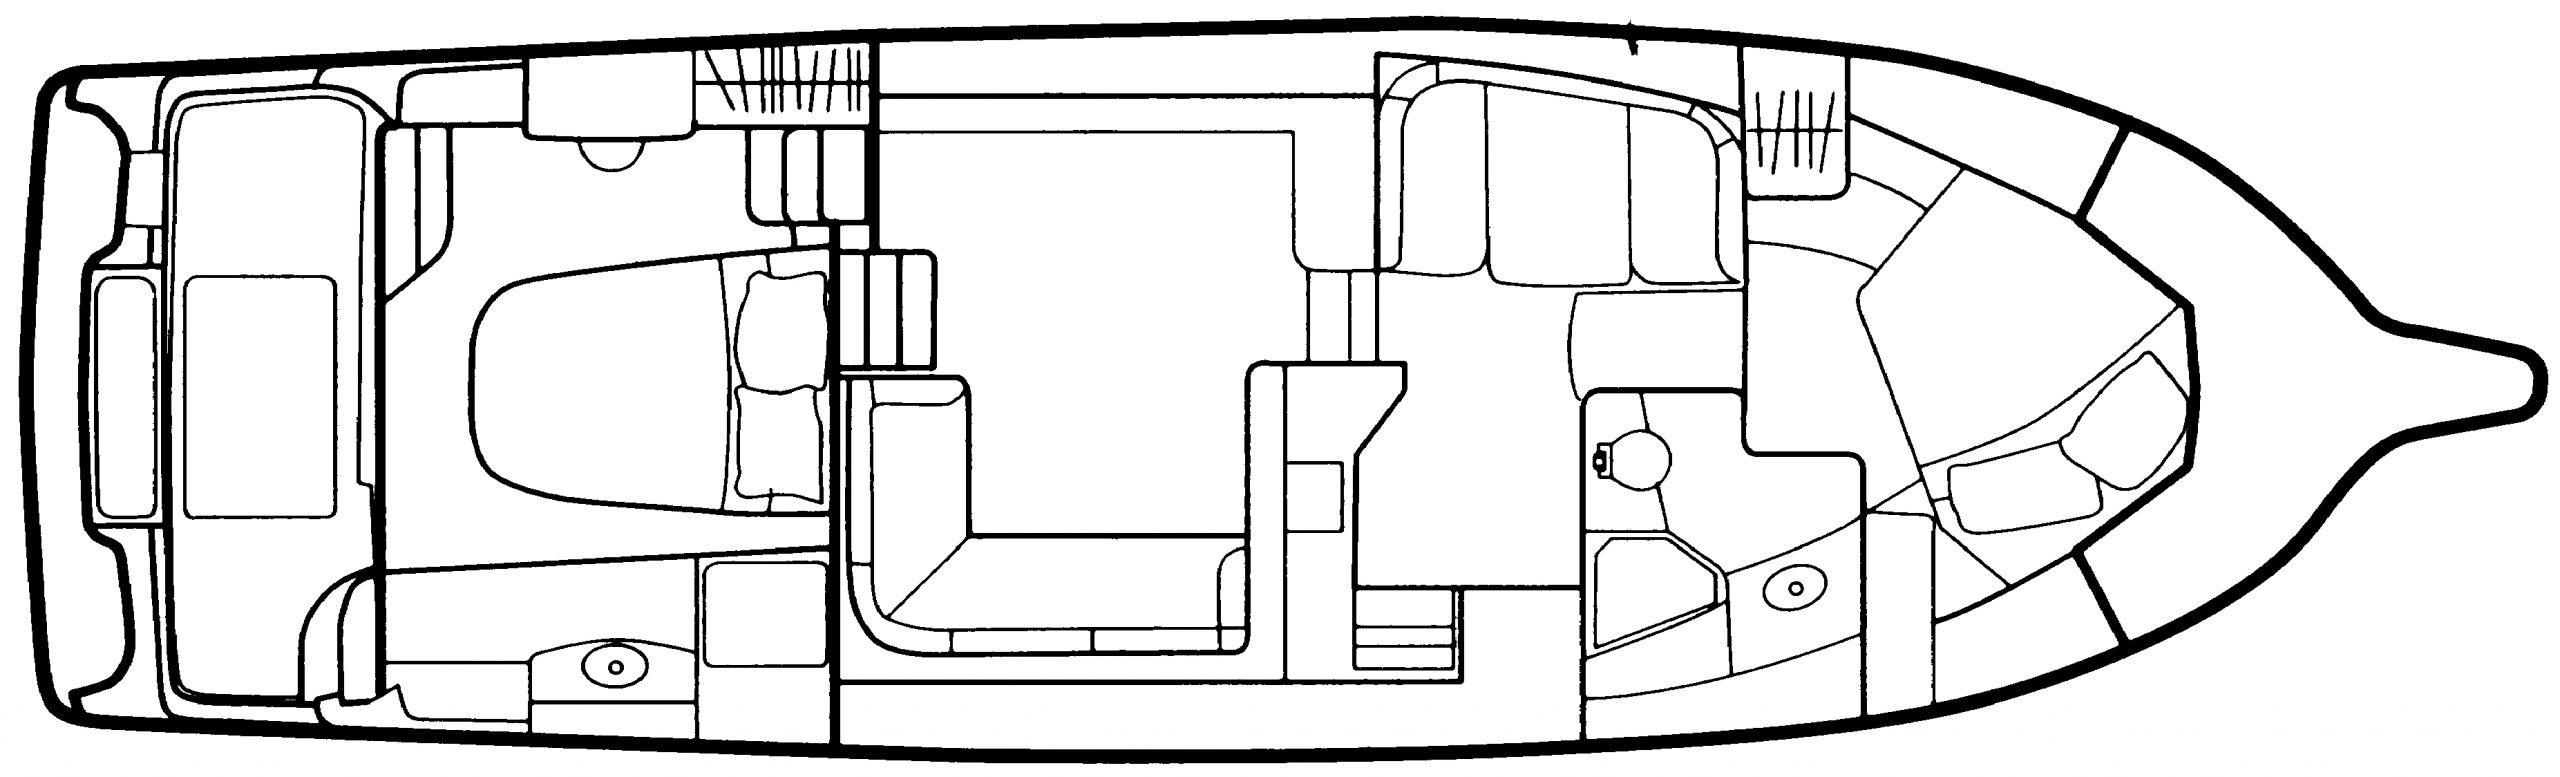 442 Cockpit Motor Yacht Floor Plan 1